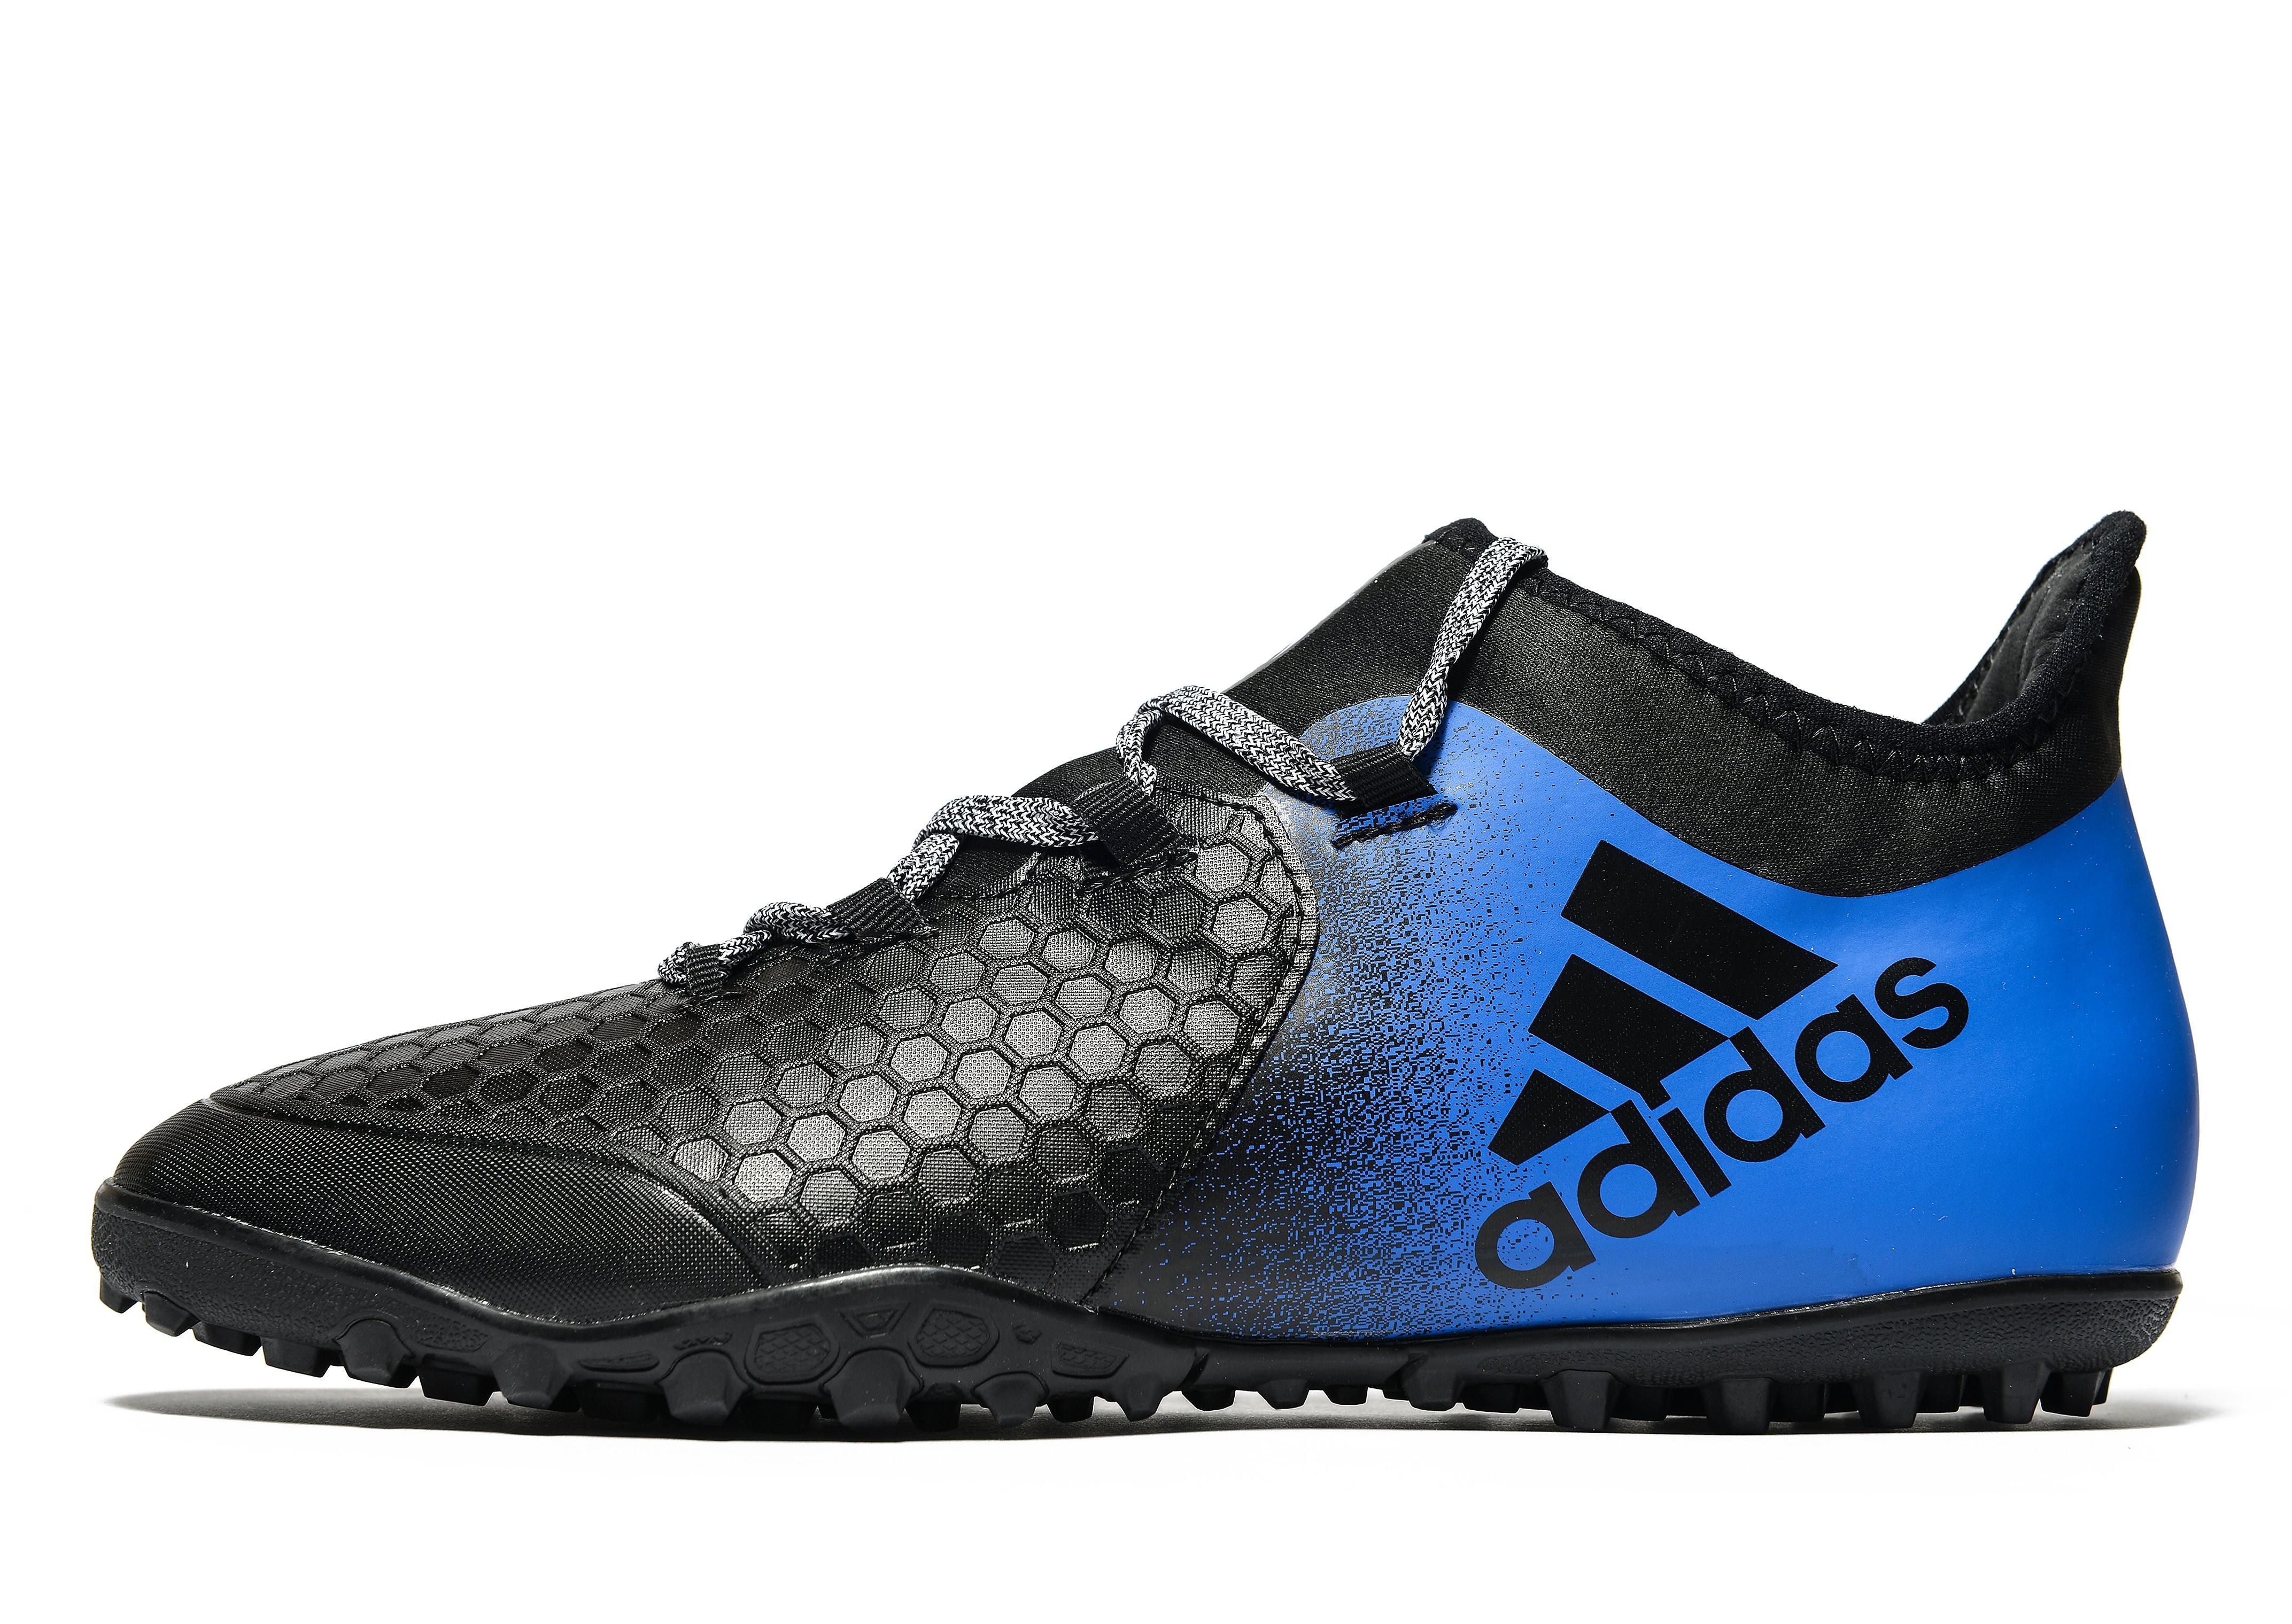 adidas Blue Blast X Tango 16.2 Turf